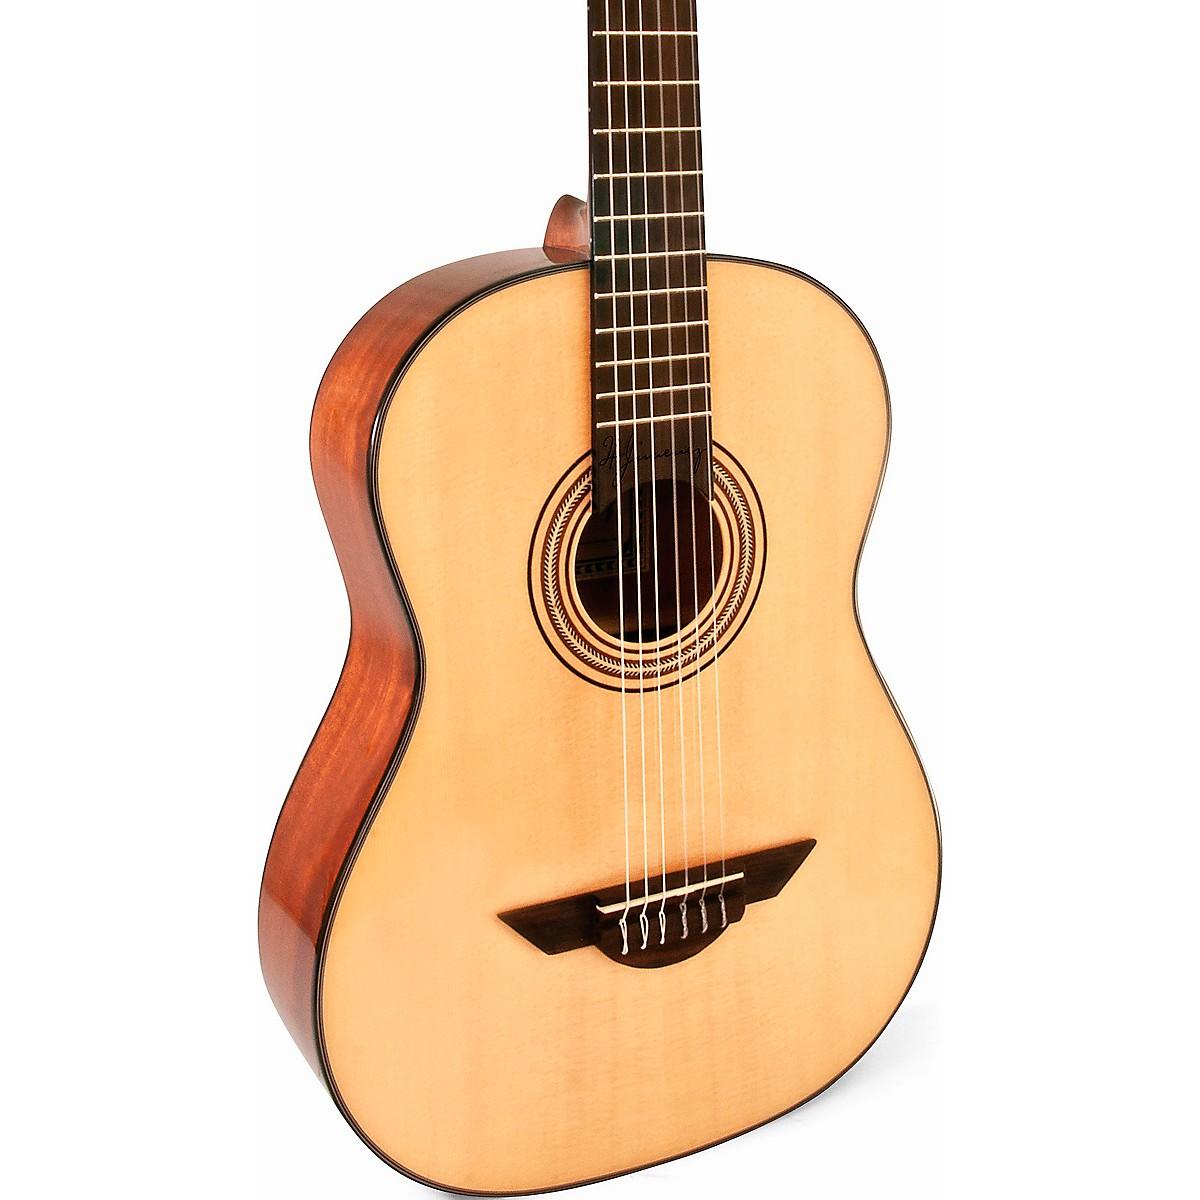 H. Jimenez LG Voz Fuerte Nylon-String with Spruce Top Acoustic Guitar